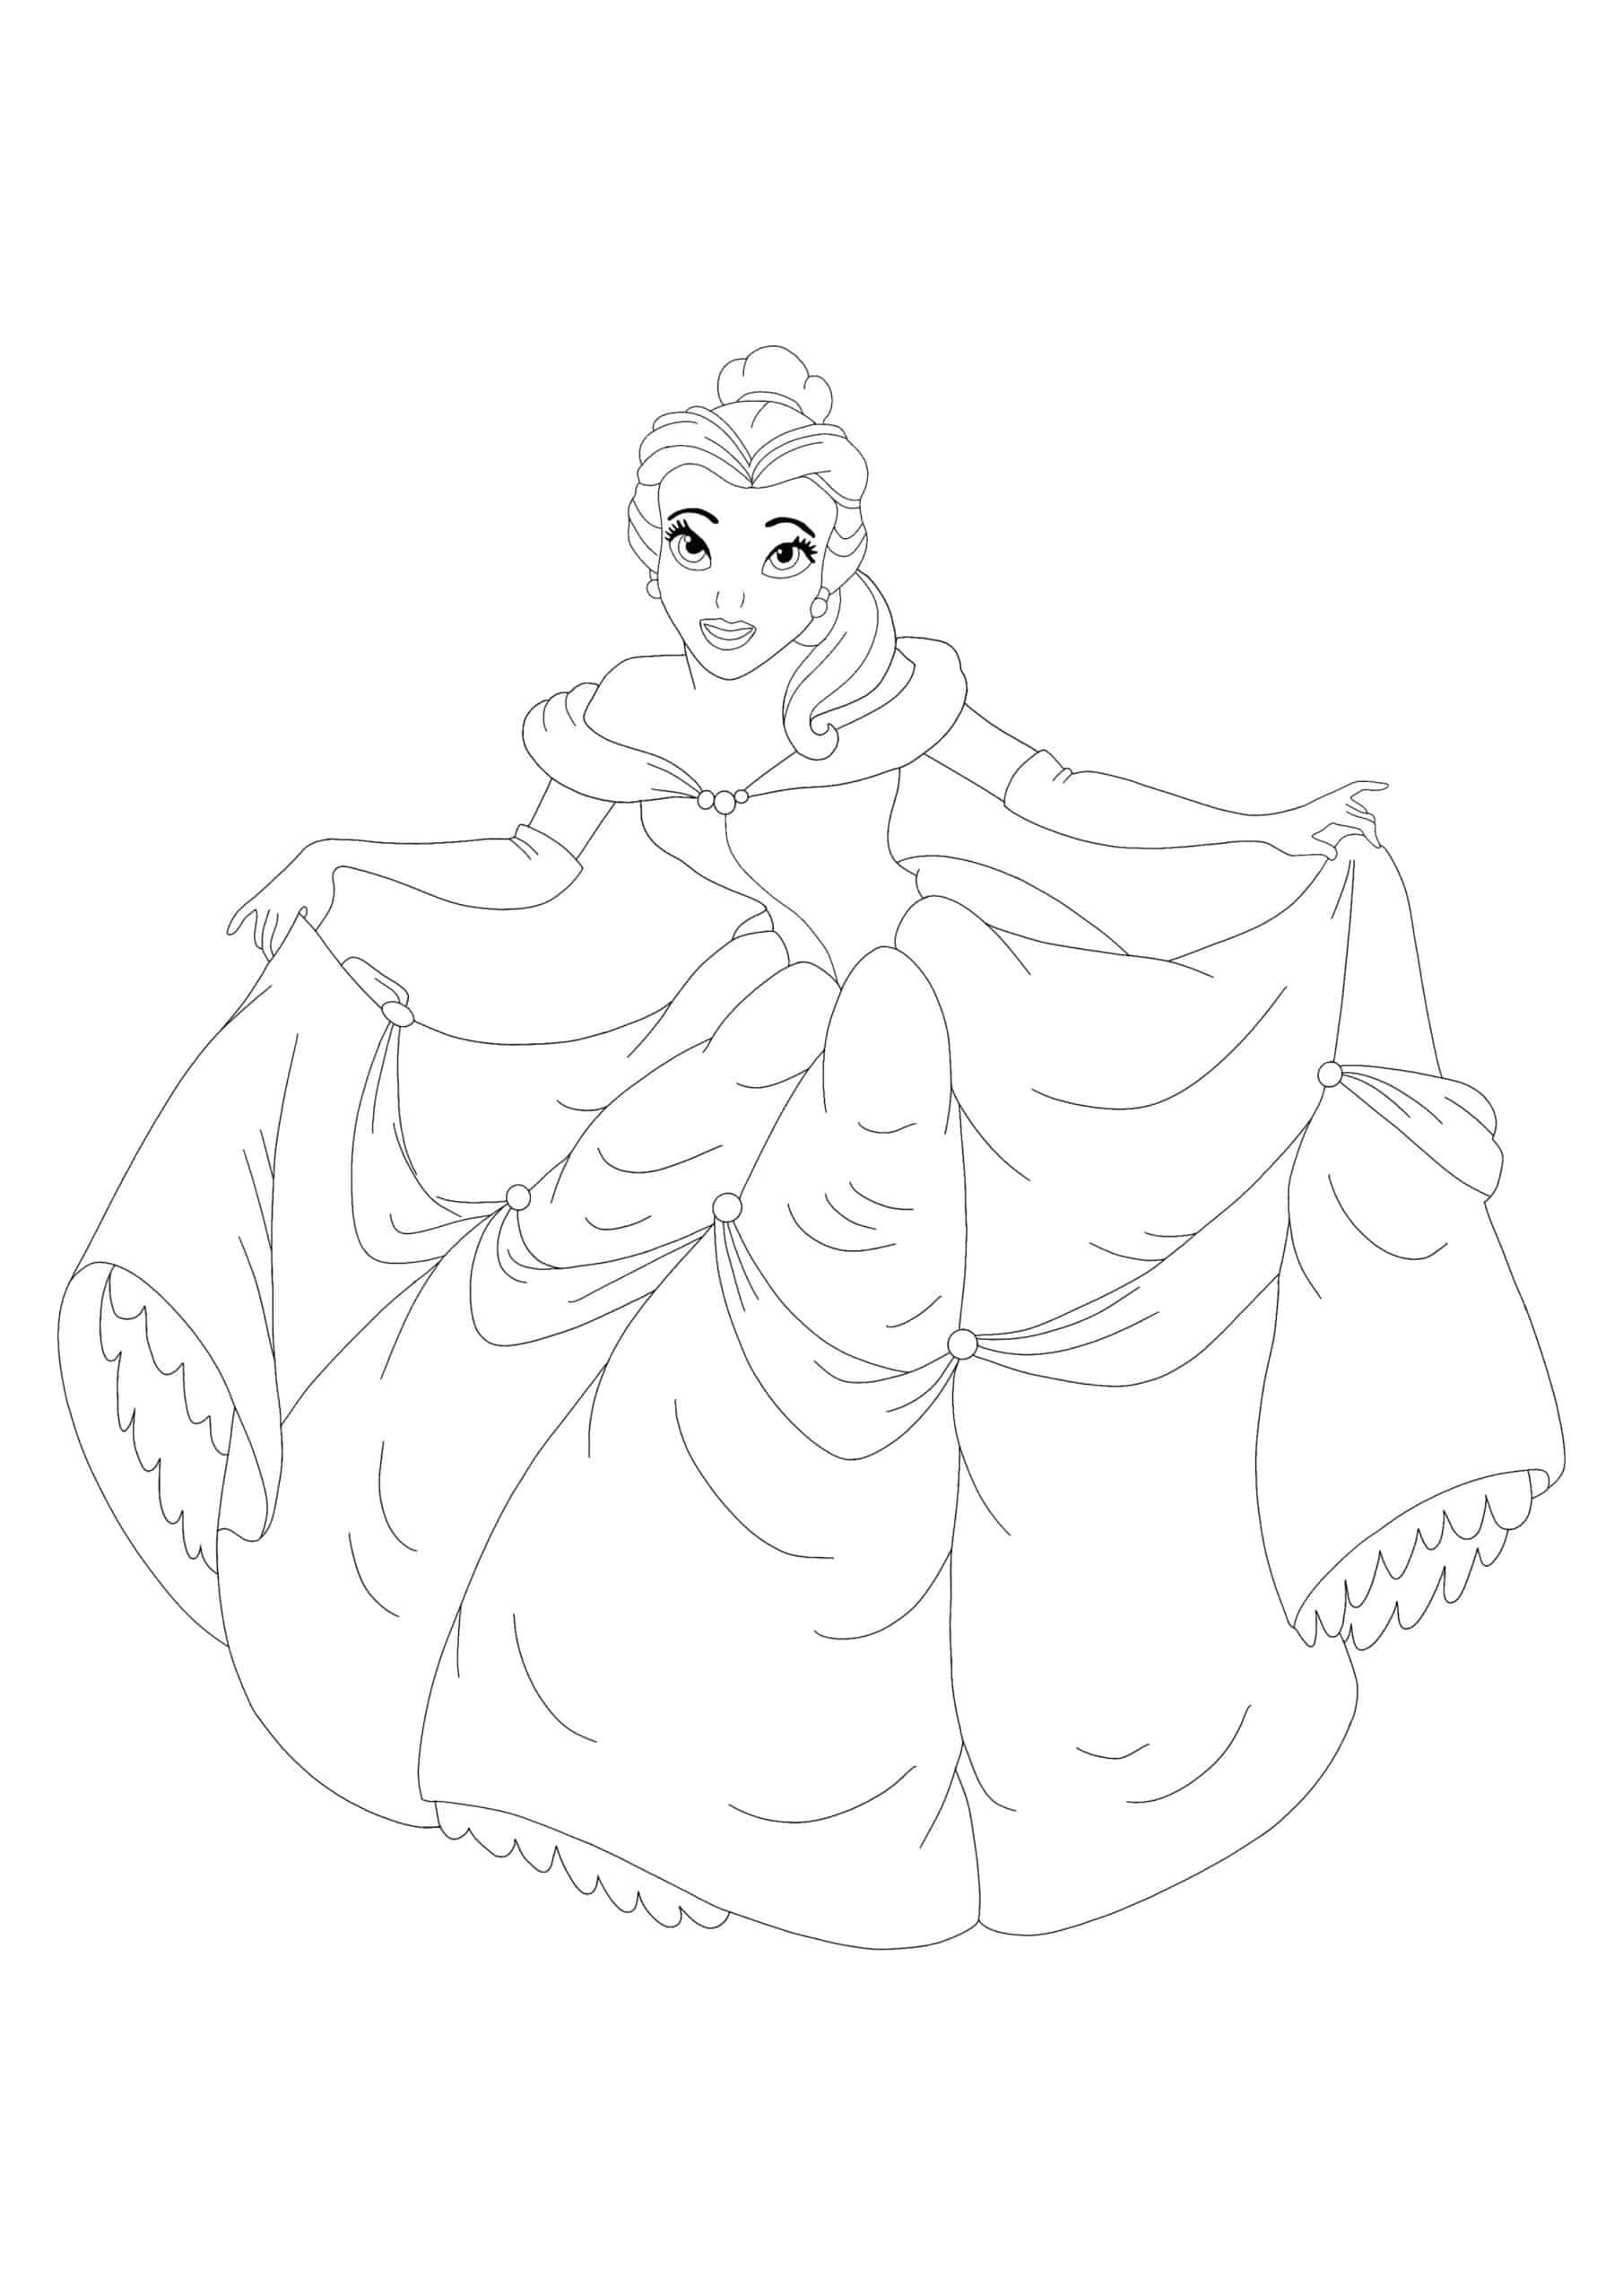 Disney Princess Belle coloring page